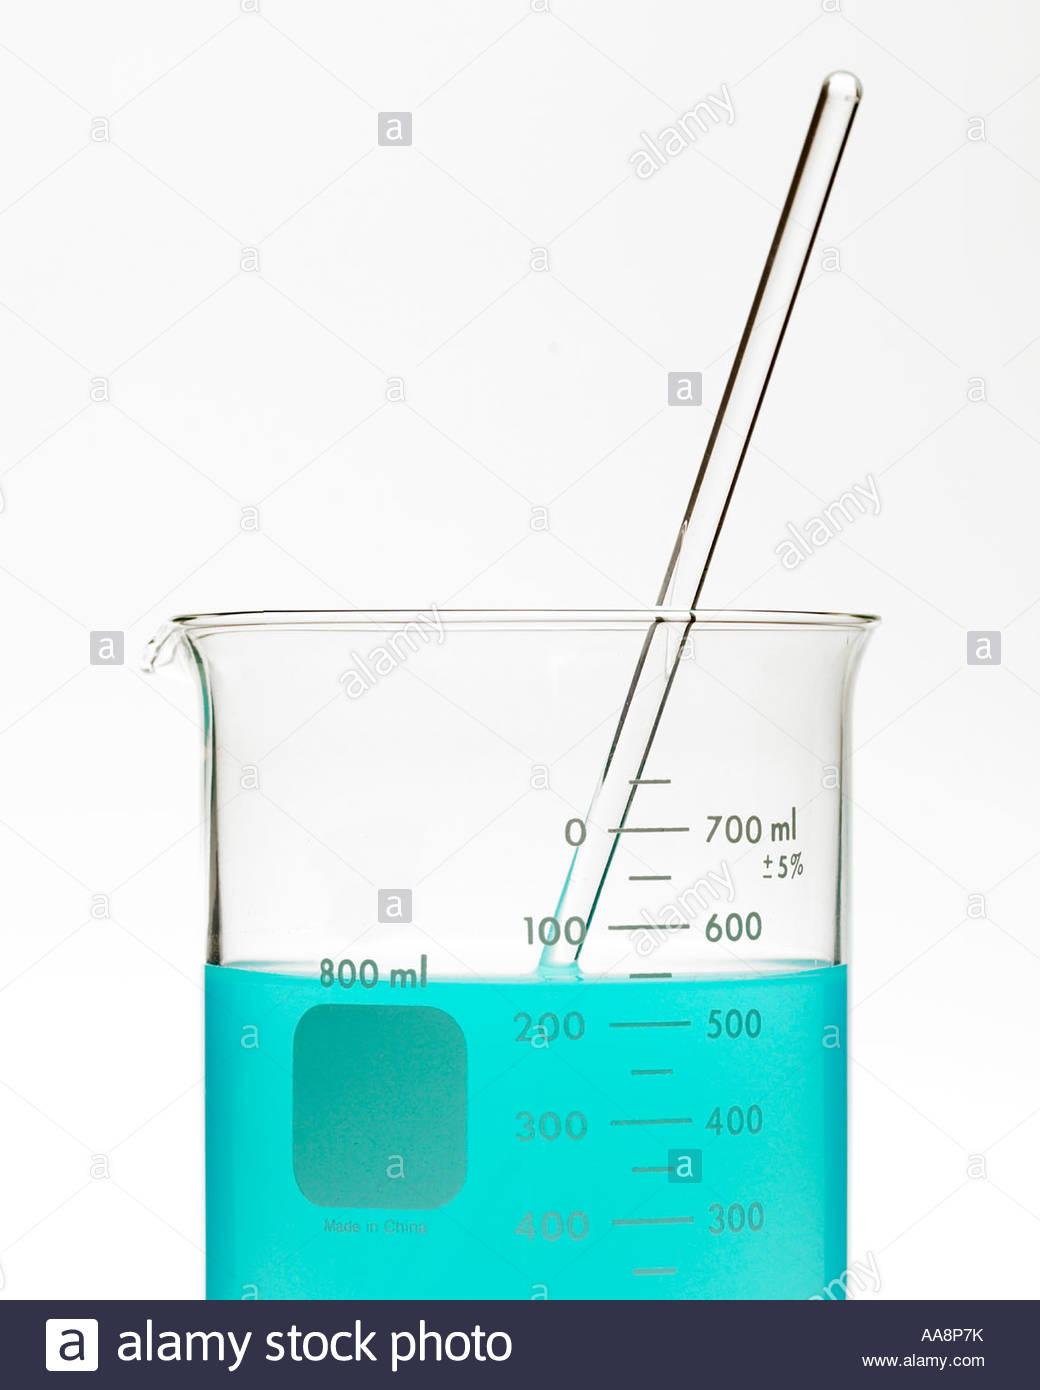 hight resolution of blue liquid in beaker with stirring rod